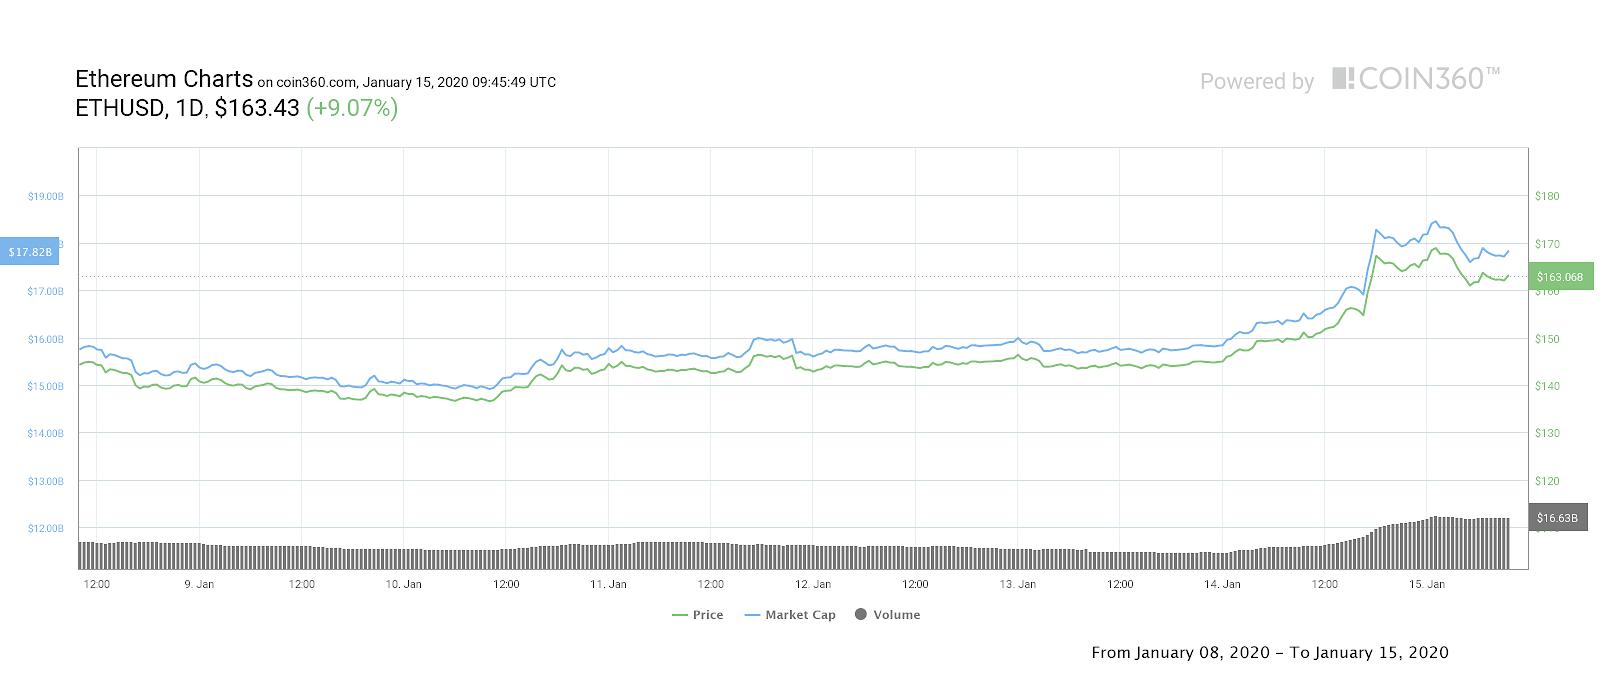 Gráfico de precios de Ether de 7 días